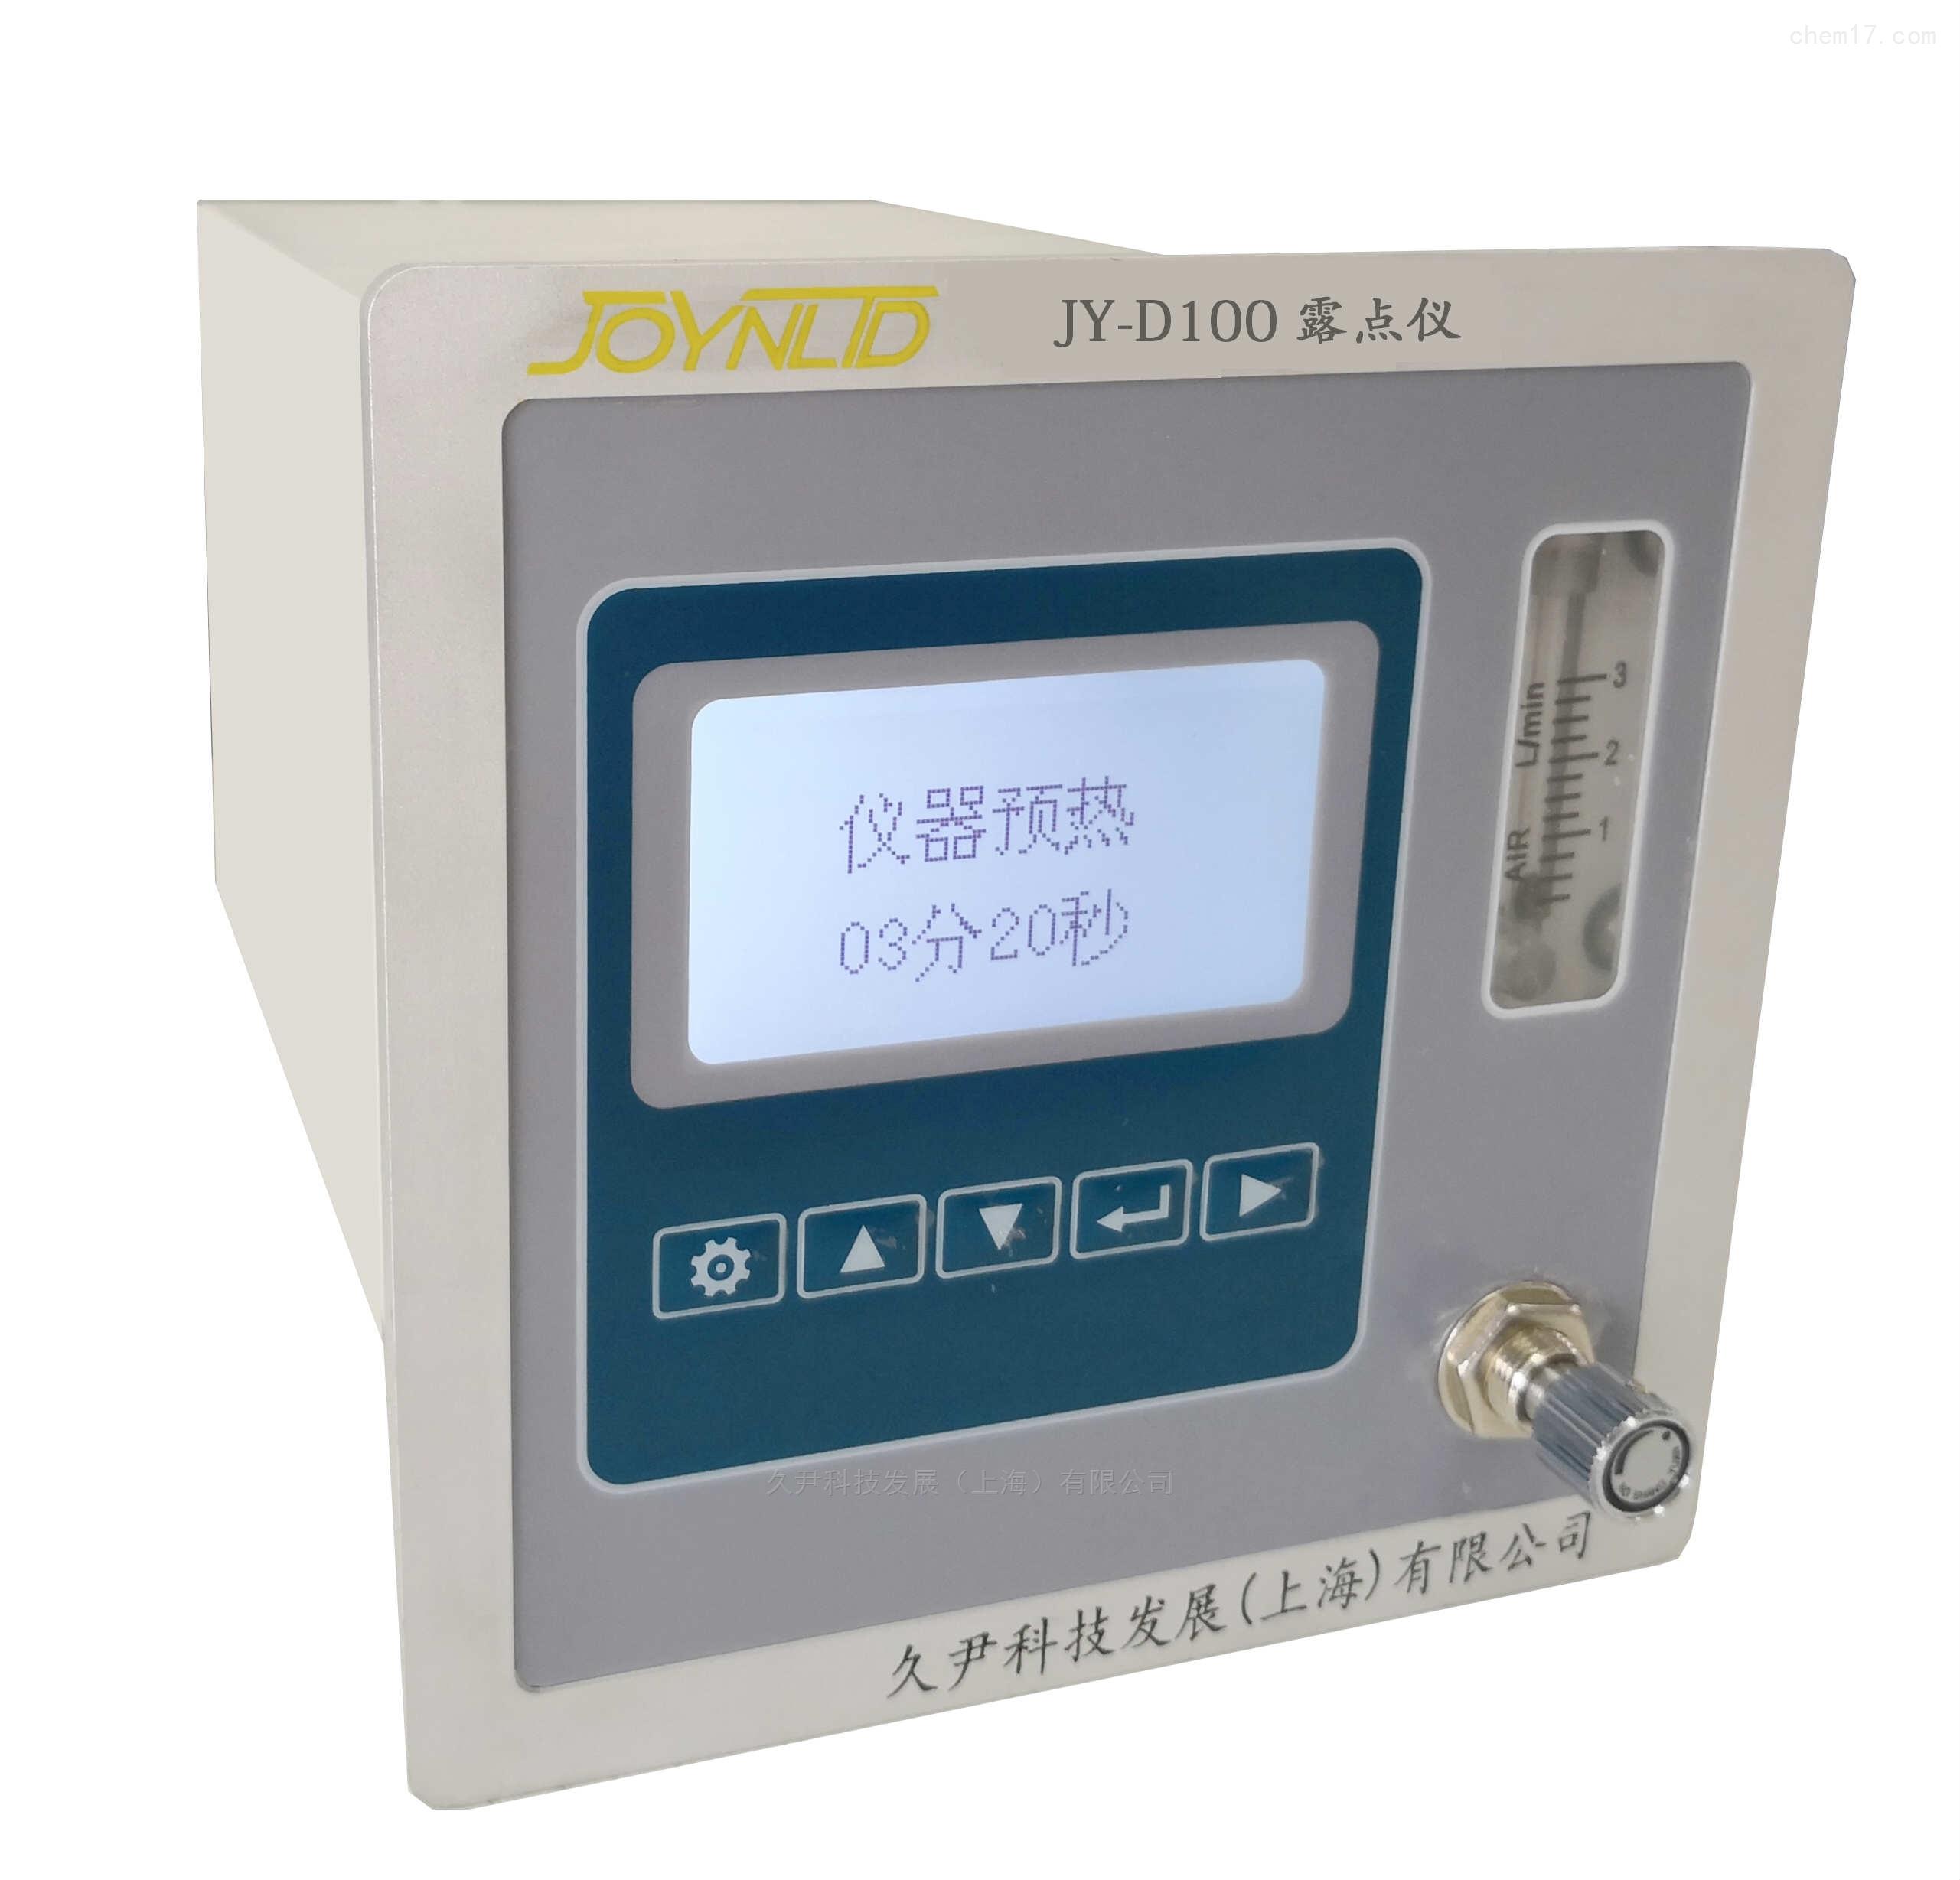 JY-D100在线精密露点仪